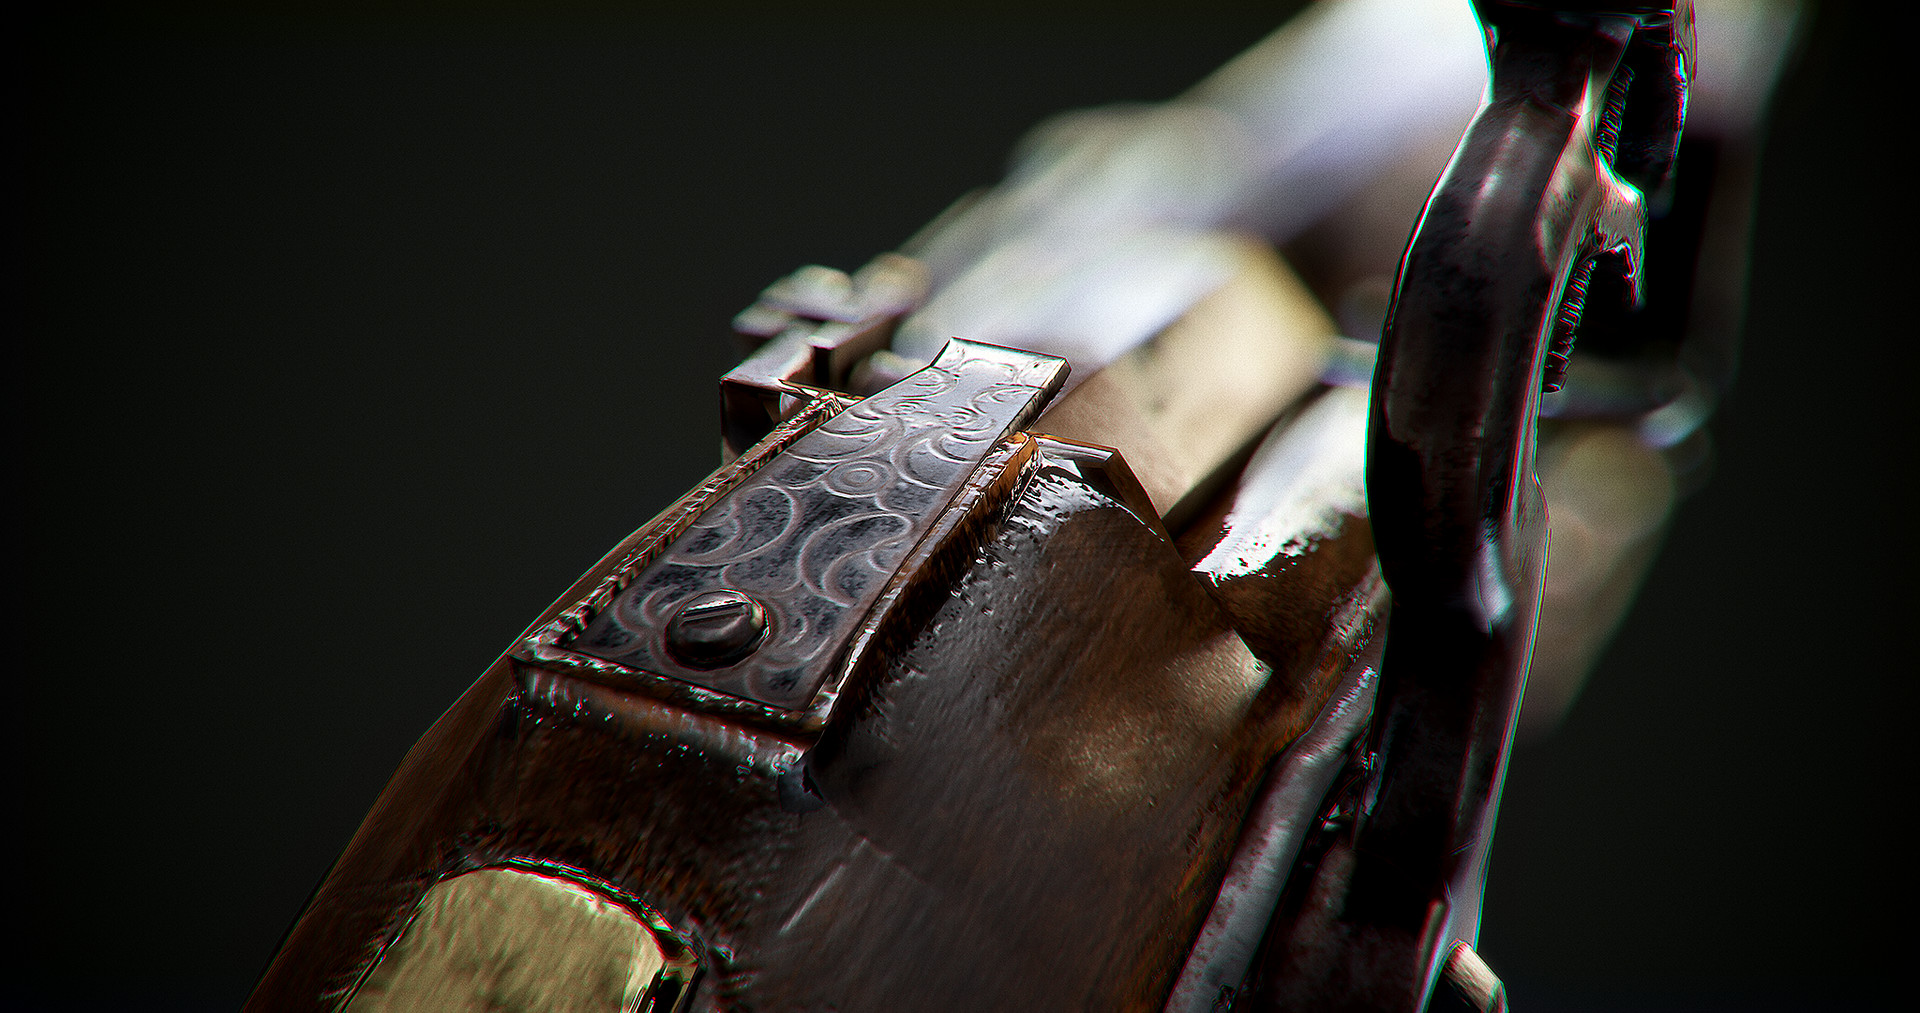 Hannu koivuranta artstation barrelholder detail